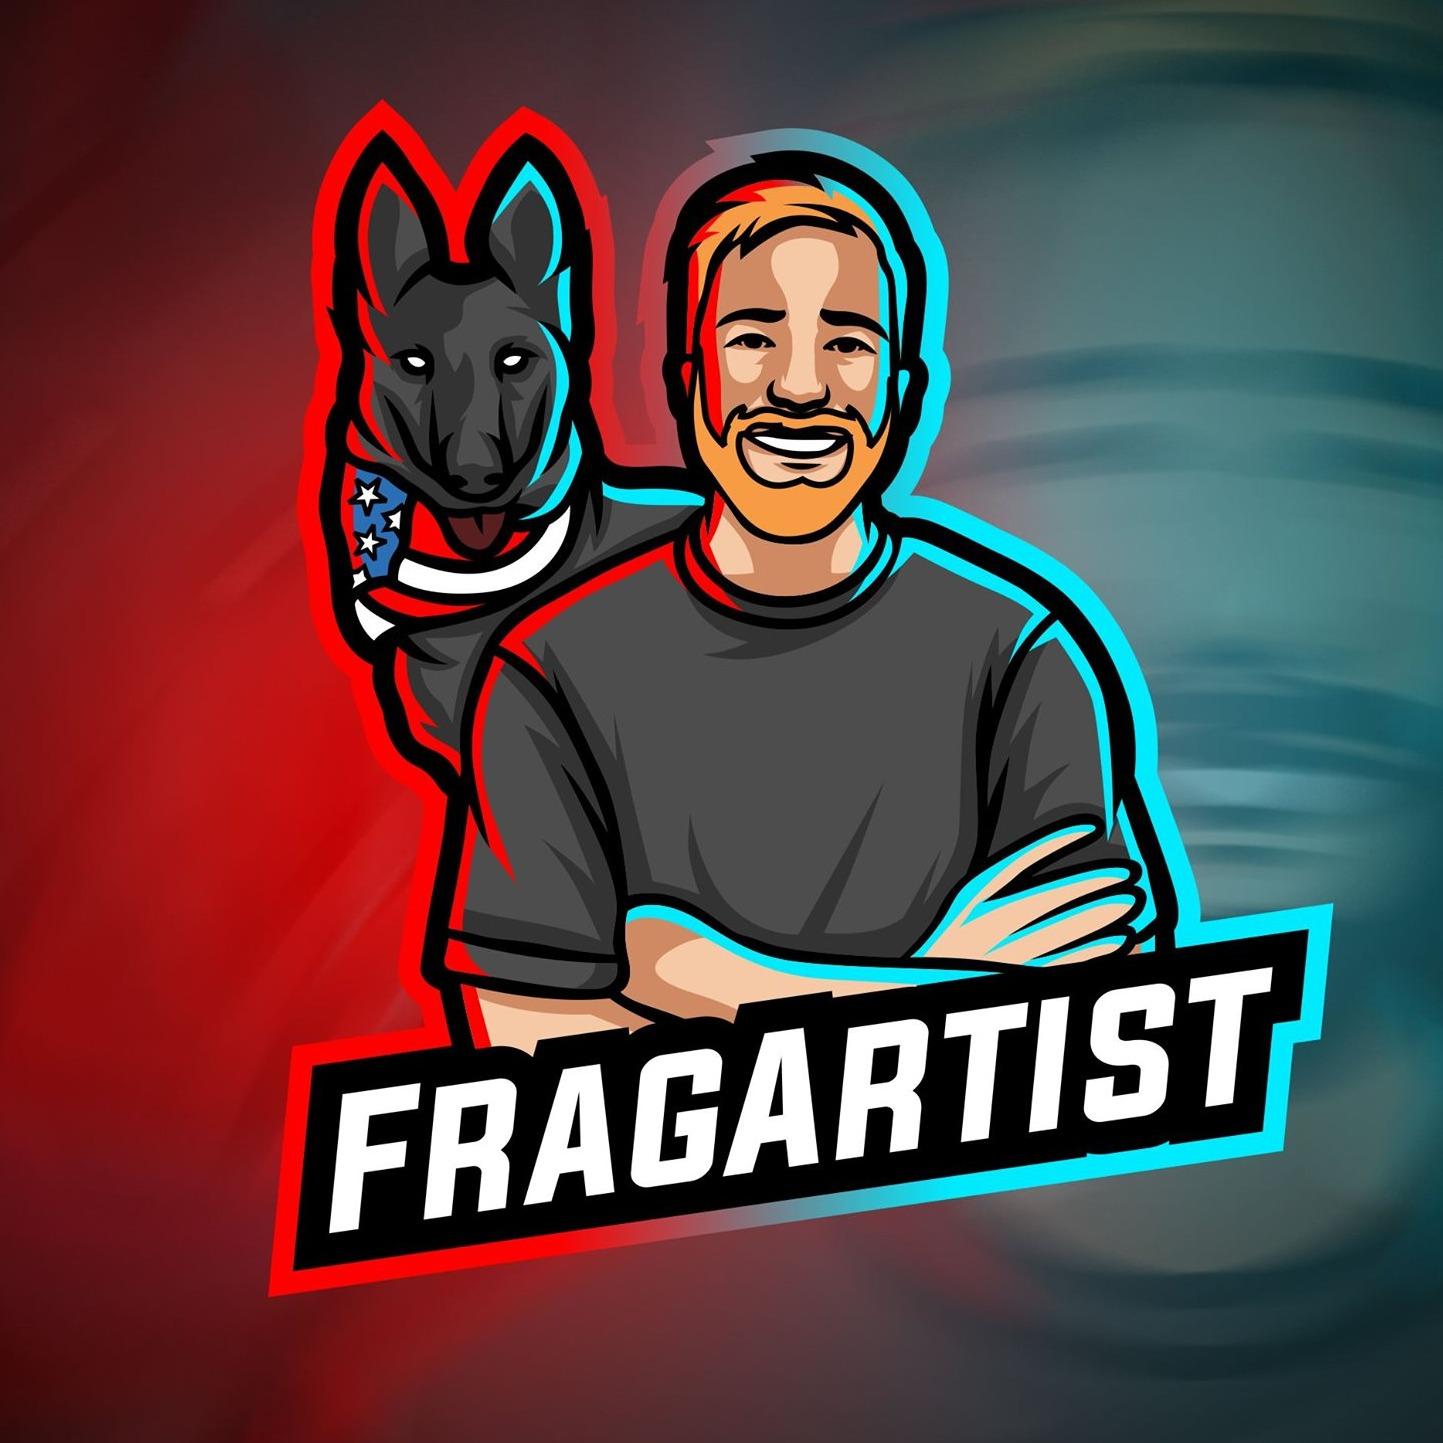 @FragArtist Profile Image | Linktree